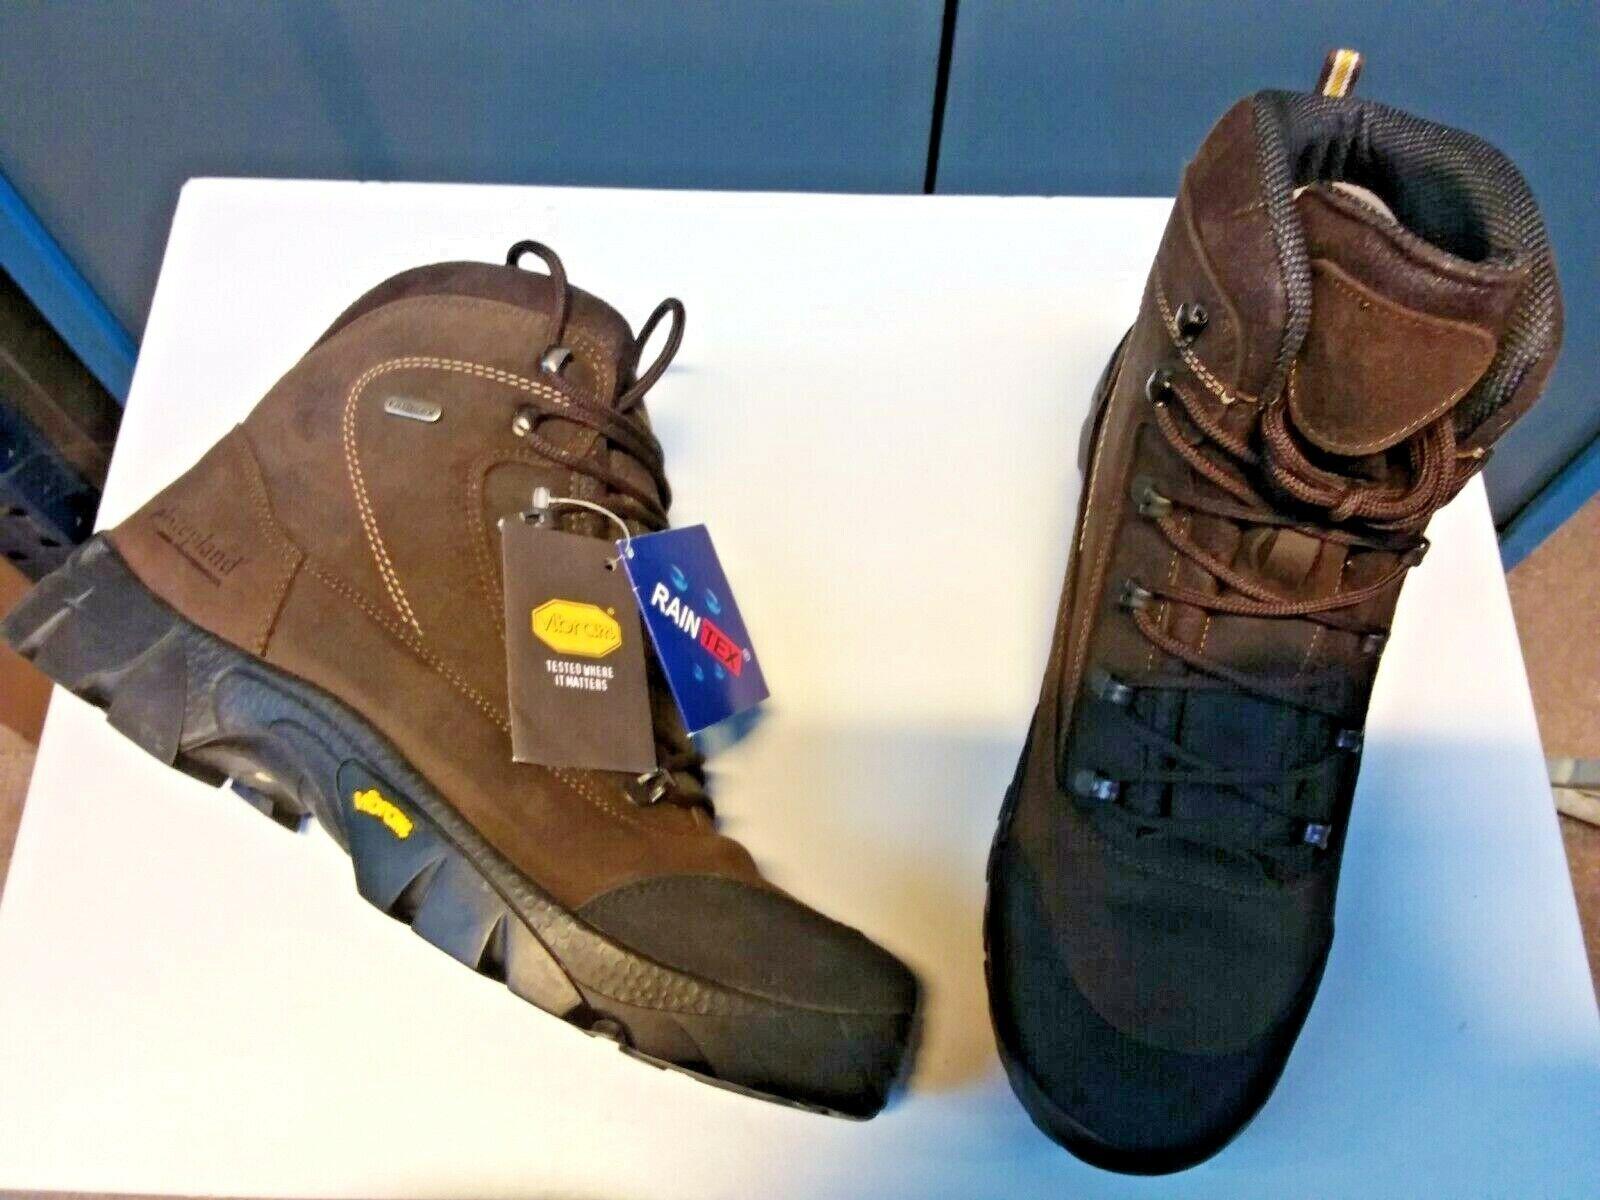 "Schuhe Wandern Stepland Model ""Vercors"" . Leder, Sohle Vibram. Größe 41"